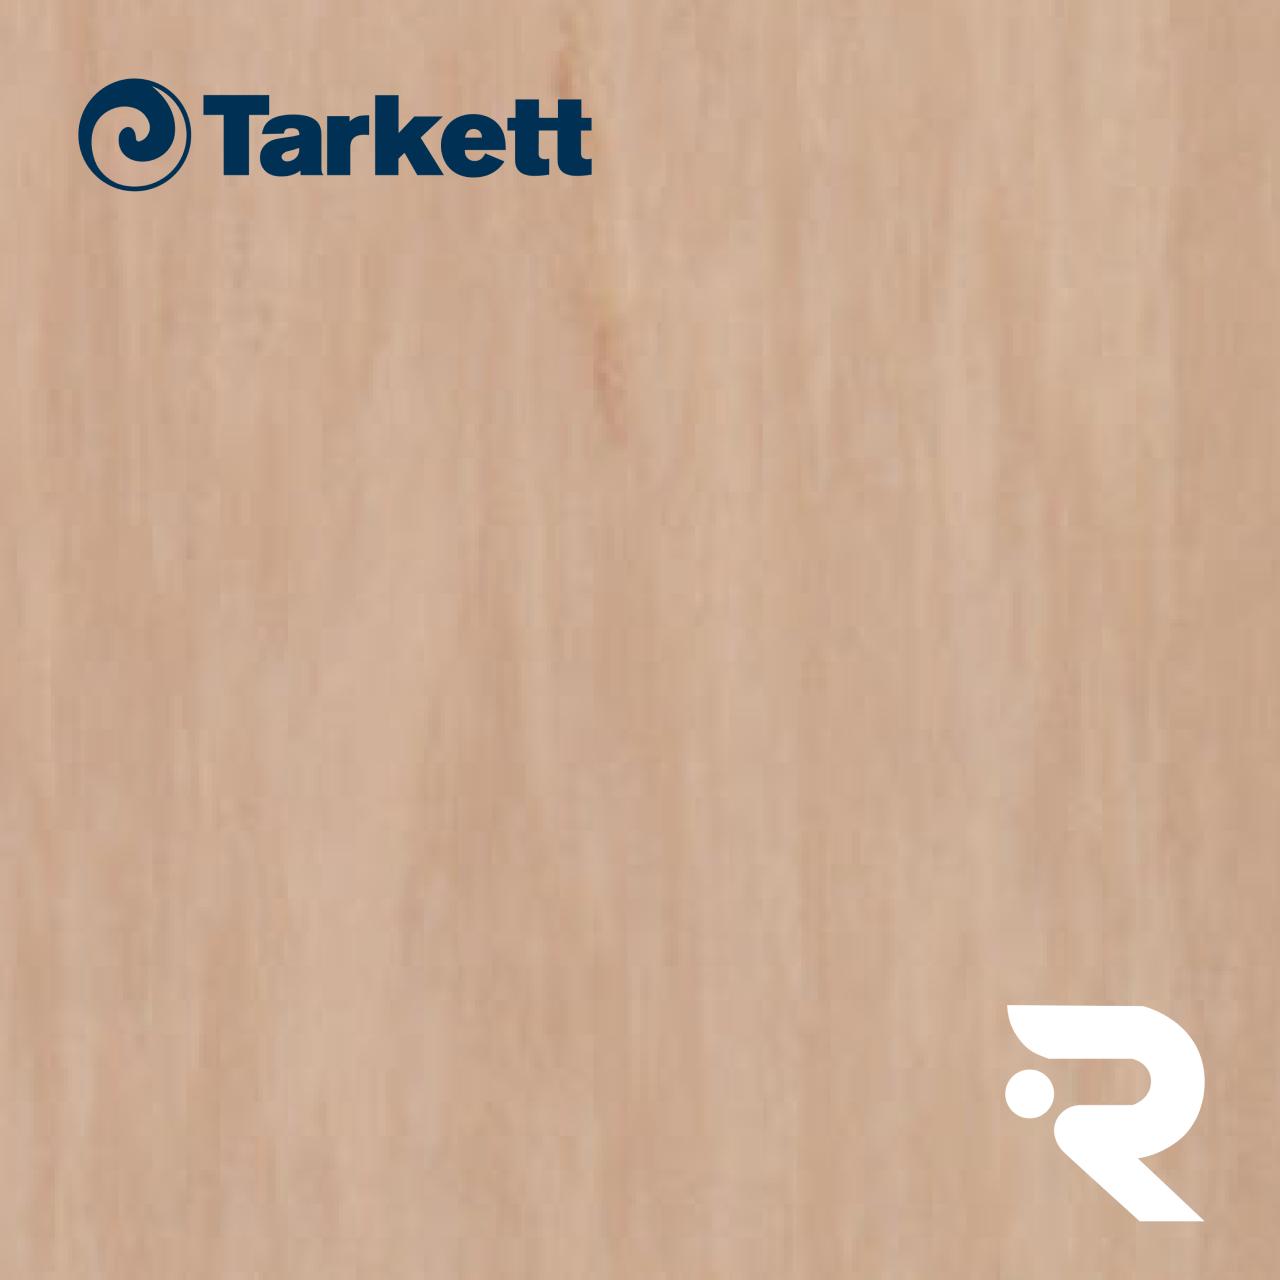 🏫 Гомогенный линолеум Tarkett   Standard SAND MEDIUM 0914   Standard Plus 2.0 mm   2 х 23 м